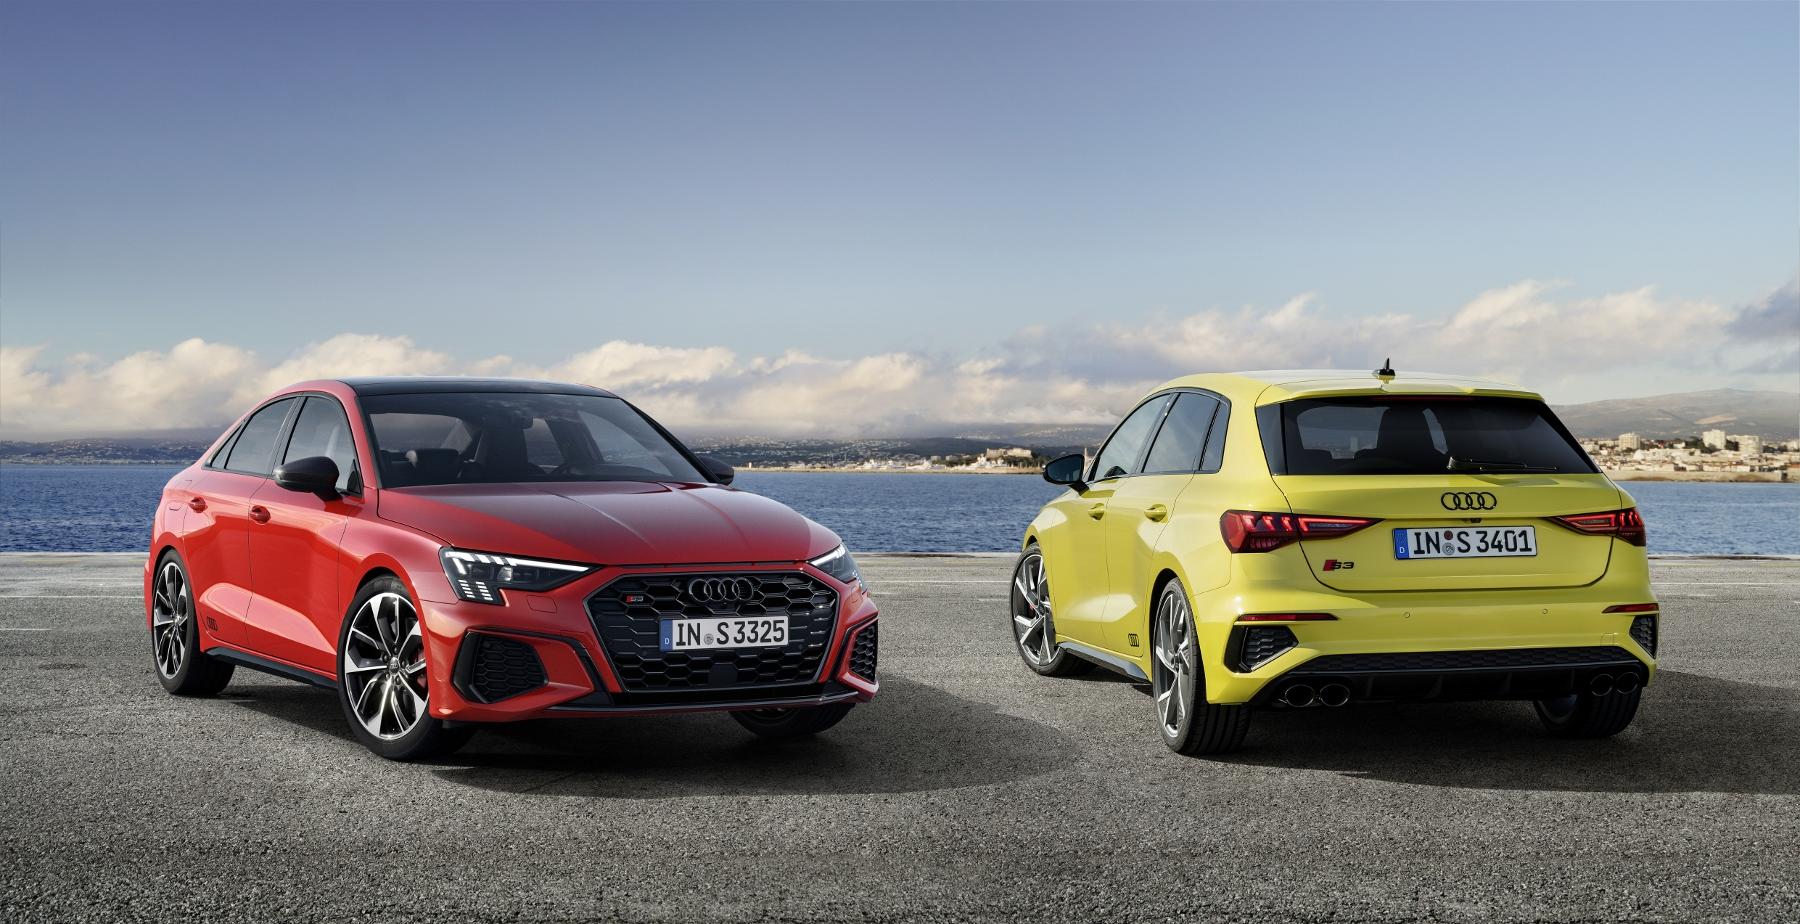 Audi ukázalo modely S3 Sedan a Sportback. Prezradilo aj nemeckú cenu O6ieY2Jplo a204396large-1800x92